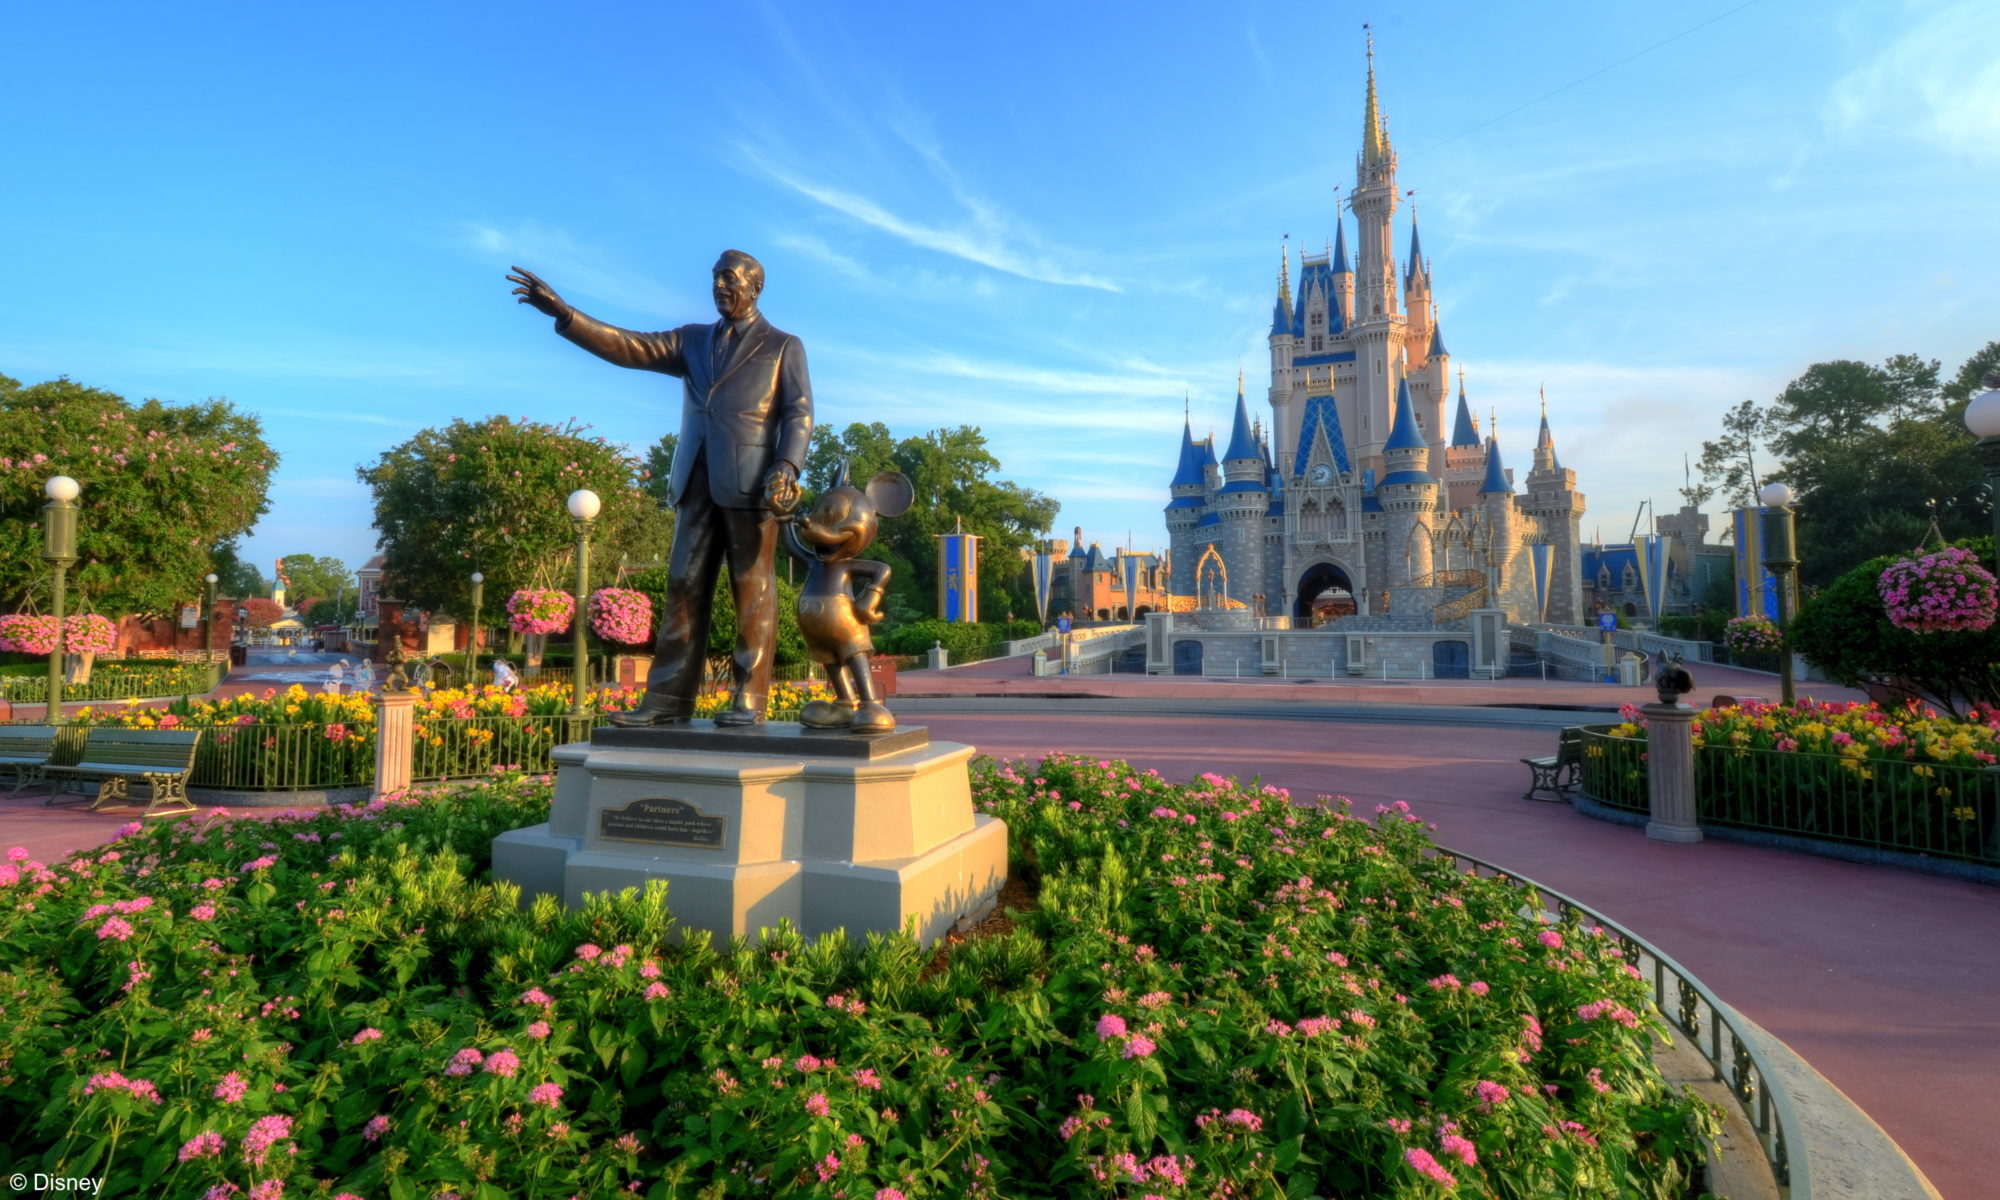 Walt Disney World's Magic Kingdom with Partners Statue and Cinderella Castle